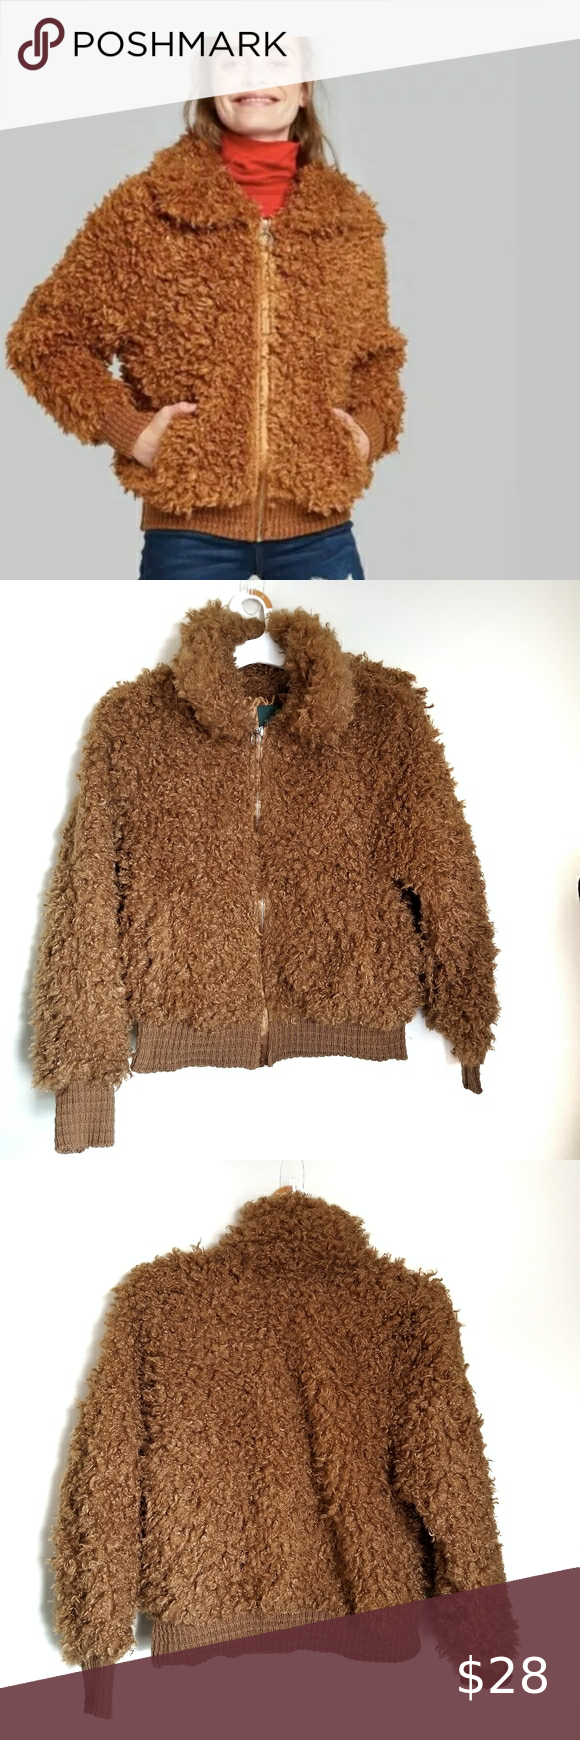 Wild Fable Teddy Fuzzy Sherpa Bomber Jacket Bomber Jacket Jackets Jackets For Women [ 1740 x 580 Pixel ]